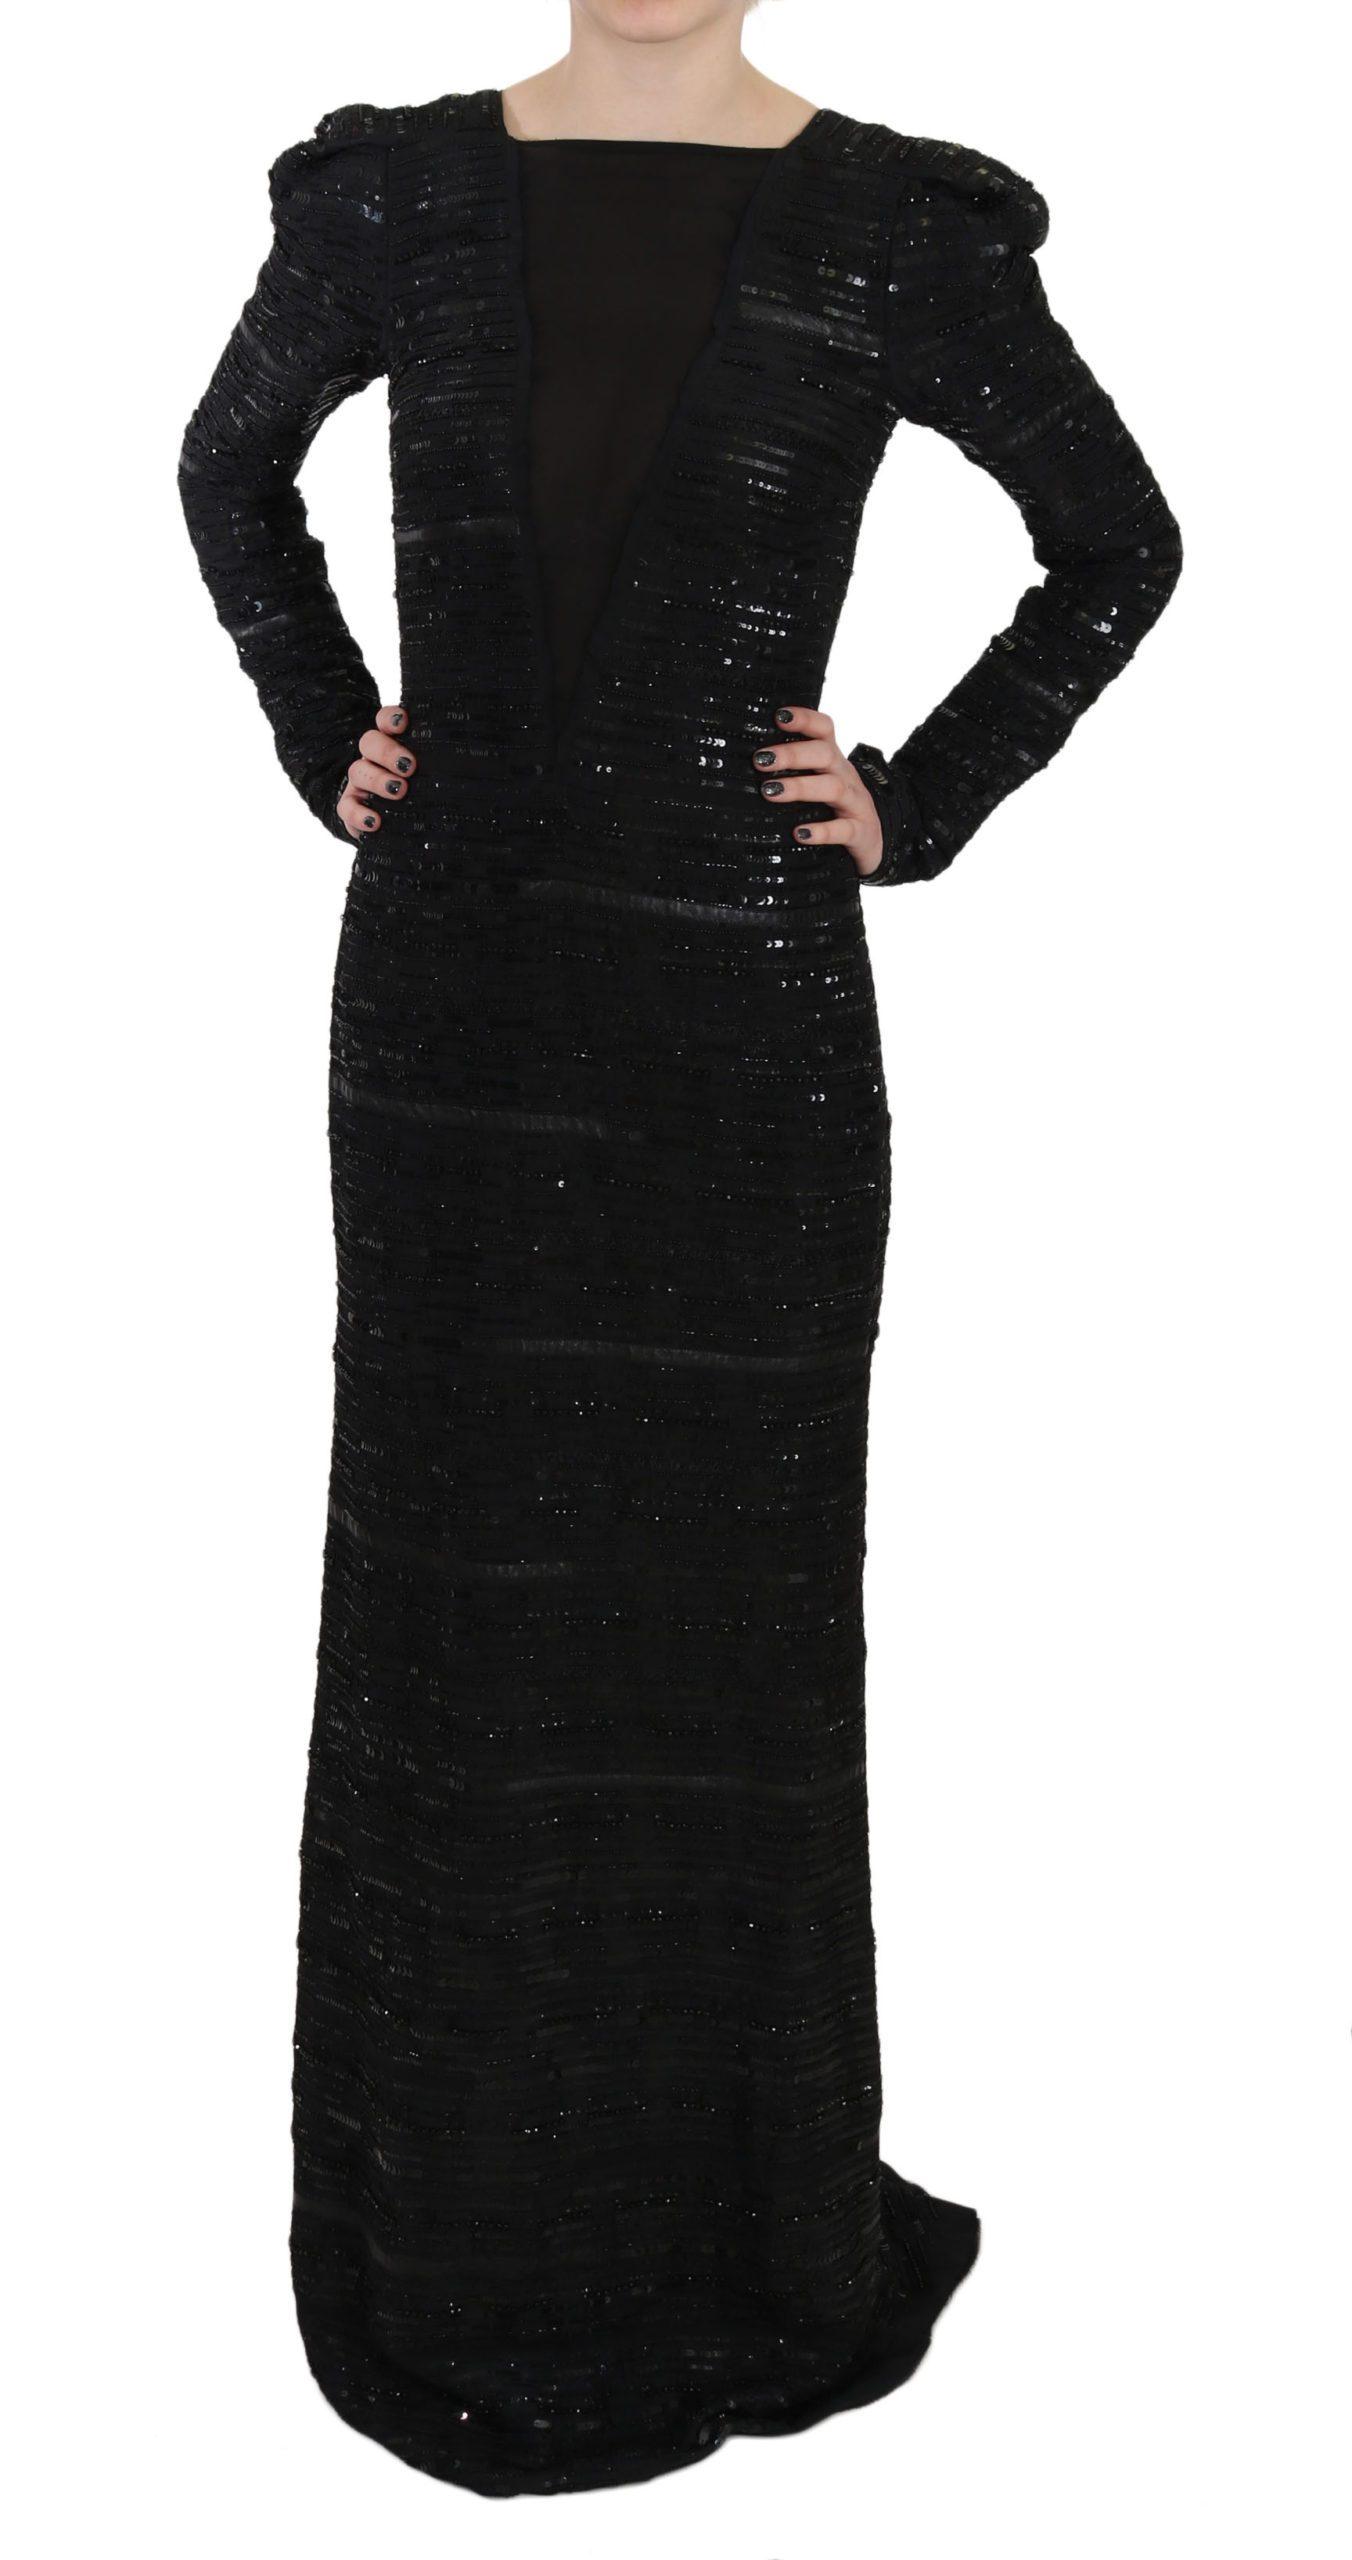 John Richmond Women's Silk Full Length Sequined Gown Dress Black DR1670 - IT40|S